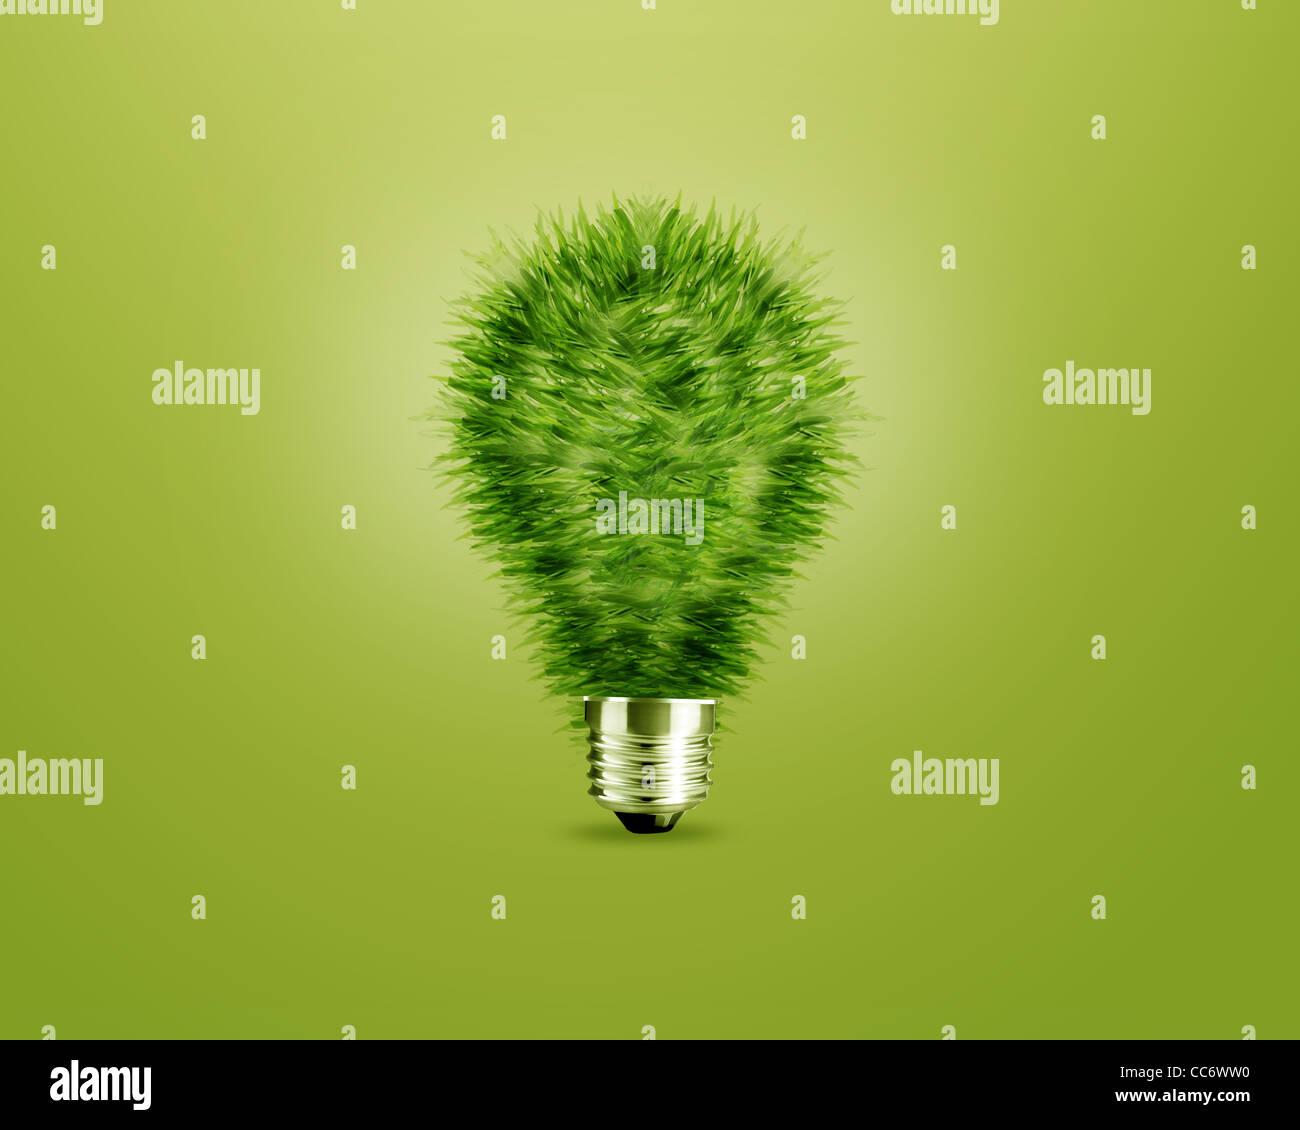 Concepto de ecología, lámpara de luz verde como un árbol. Imagen De Stock